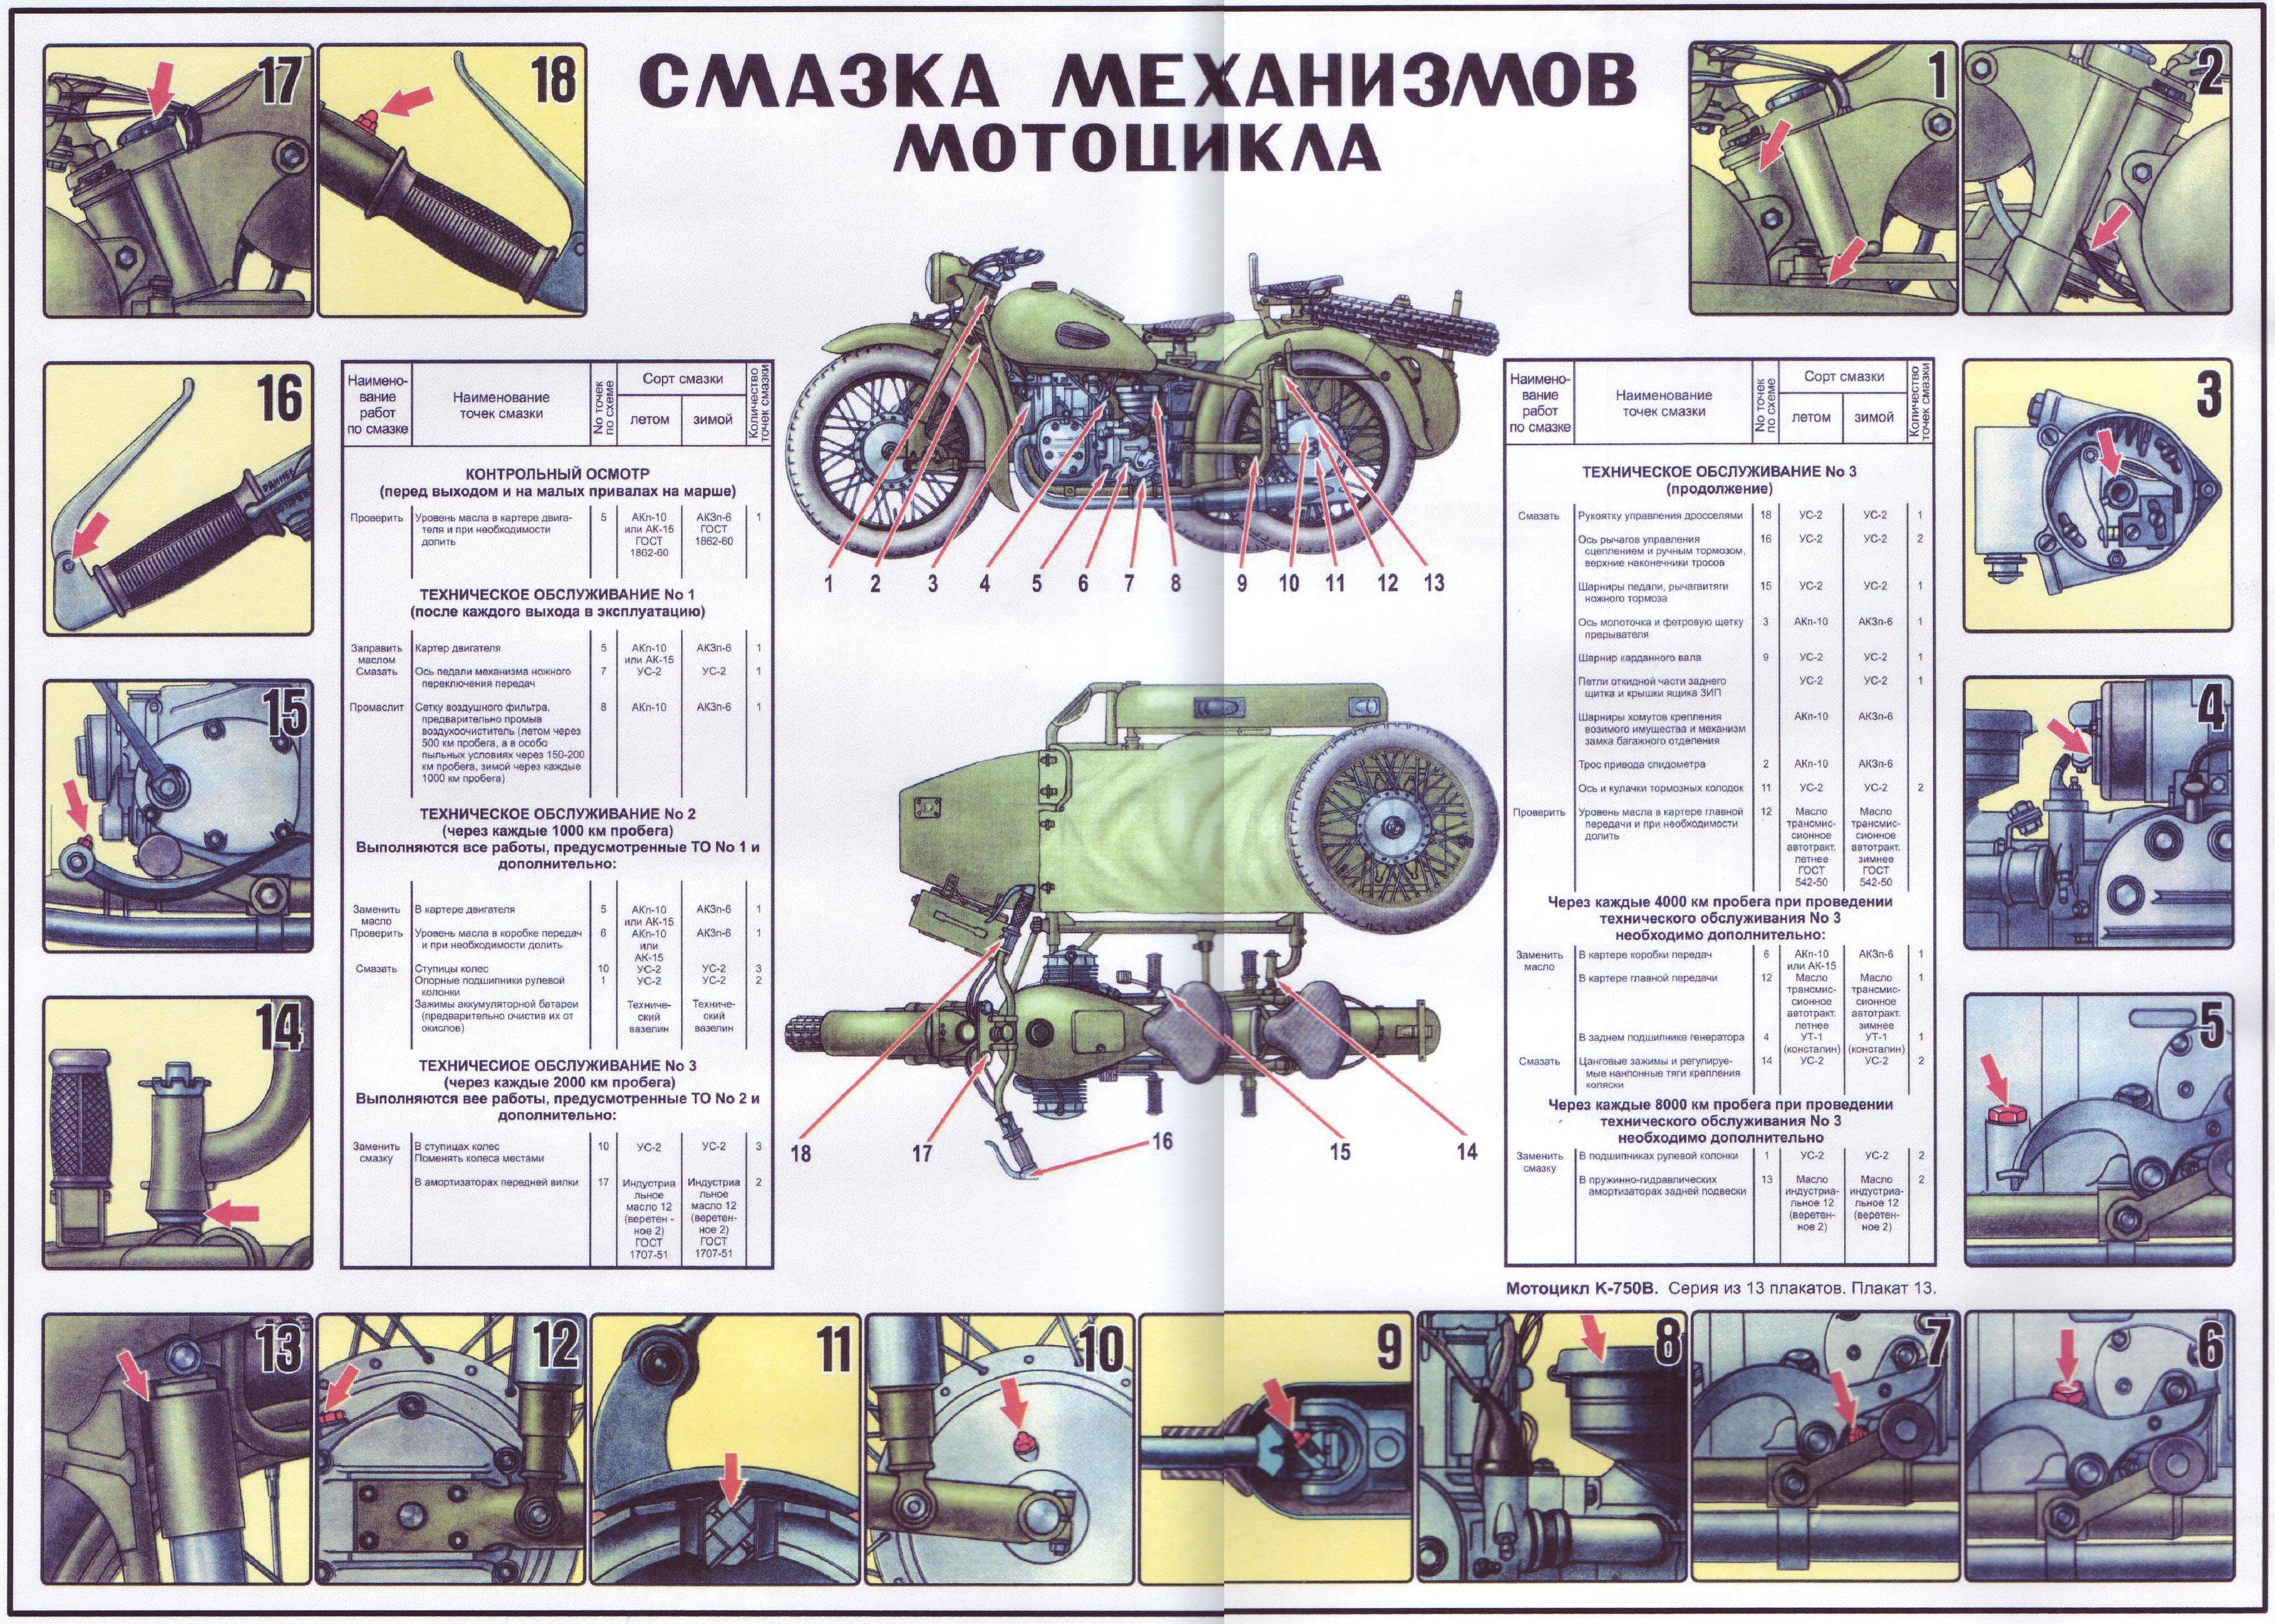 yamaha dtx multi 12 manual english